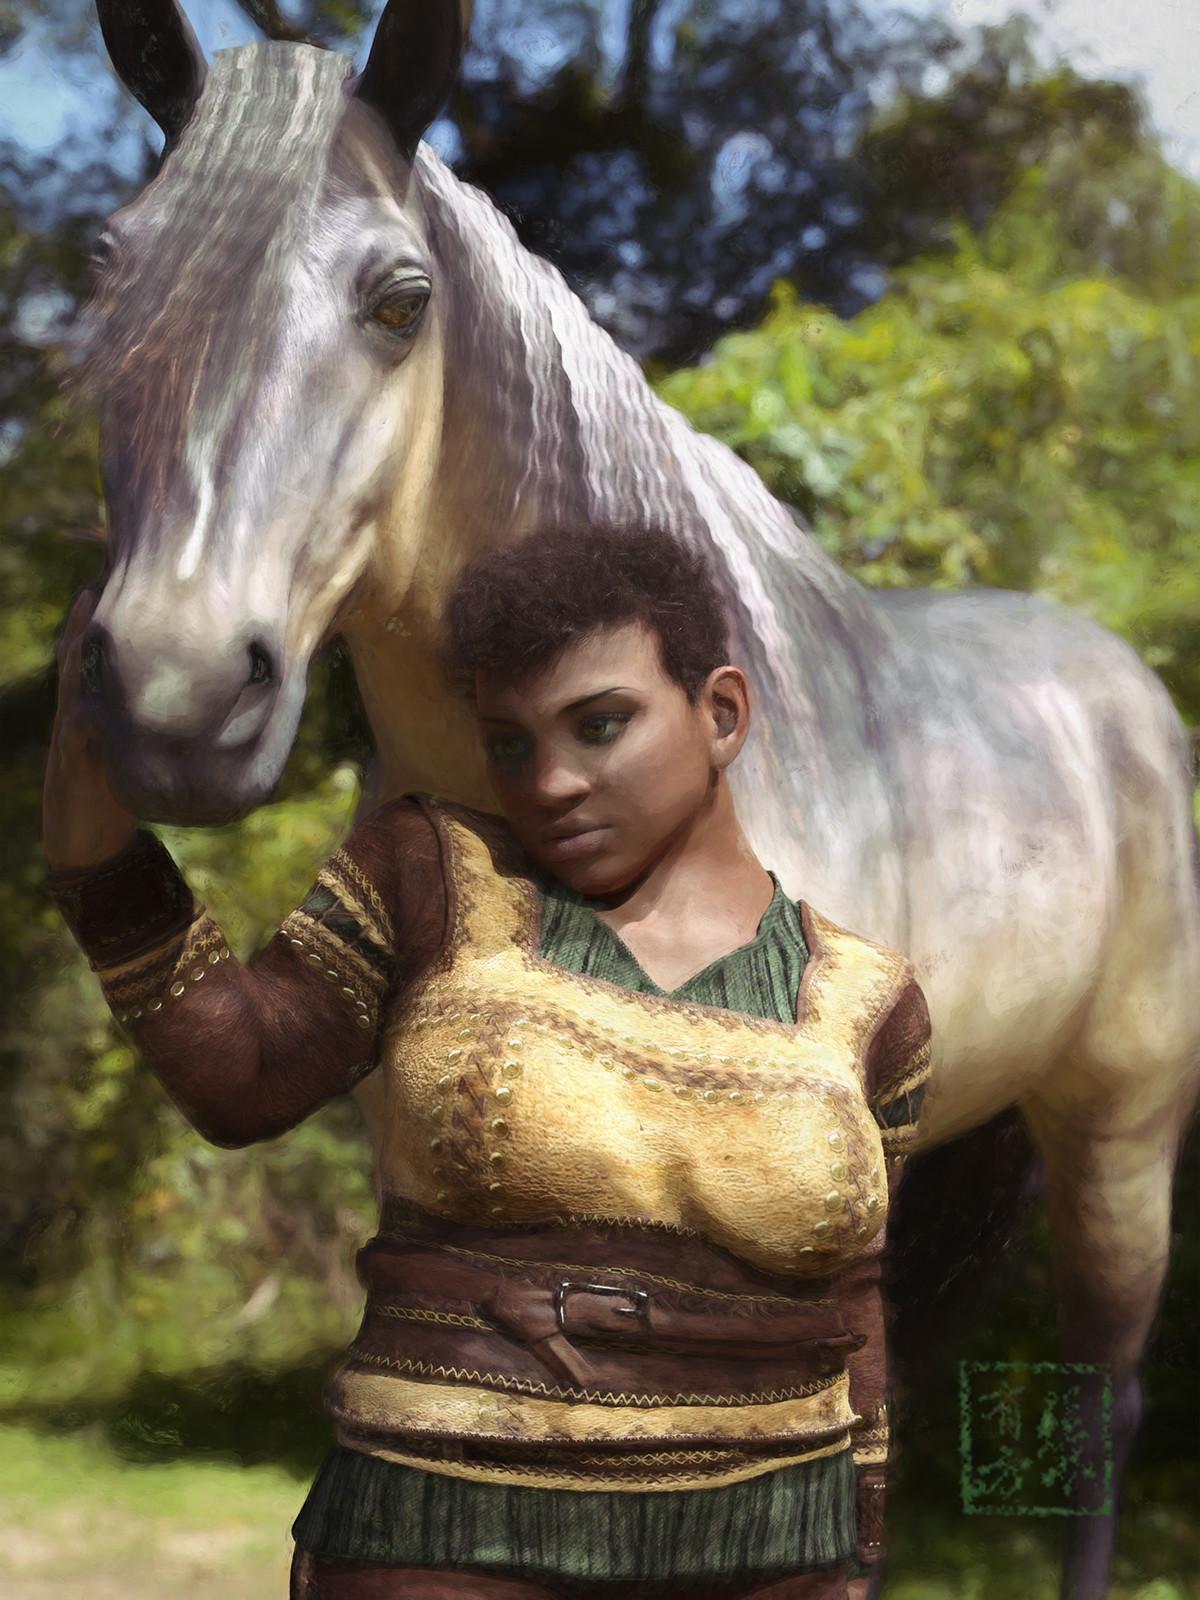 Dwarf Horsehandler